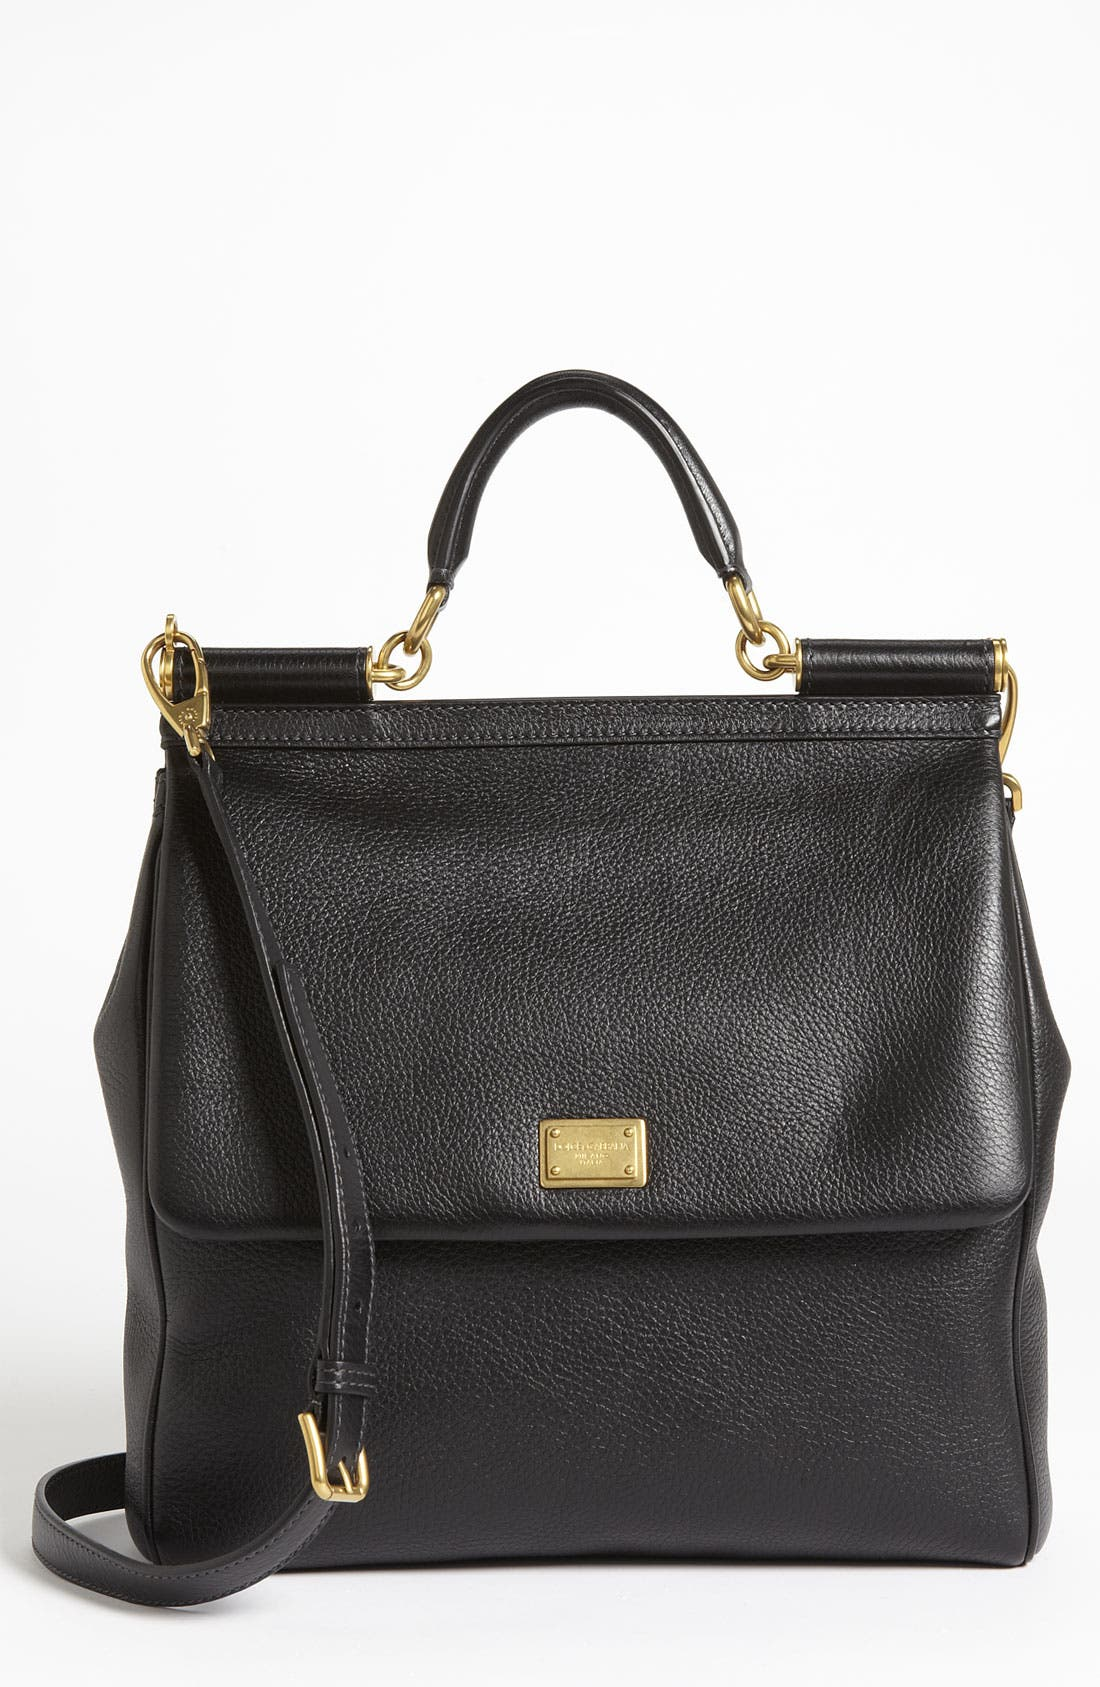 Main Image - Dolce&Gabbana 'Flat Miss Sicily - Large' Leather Satchel